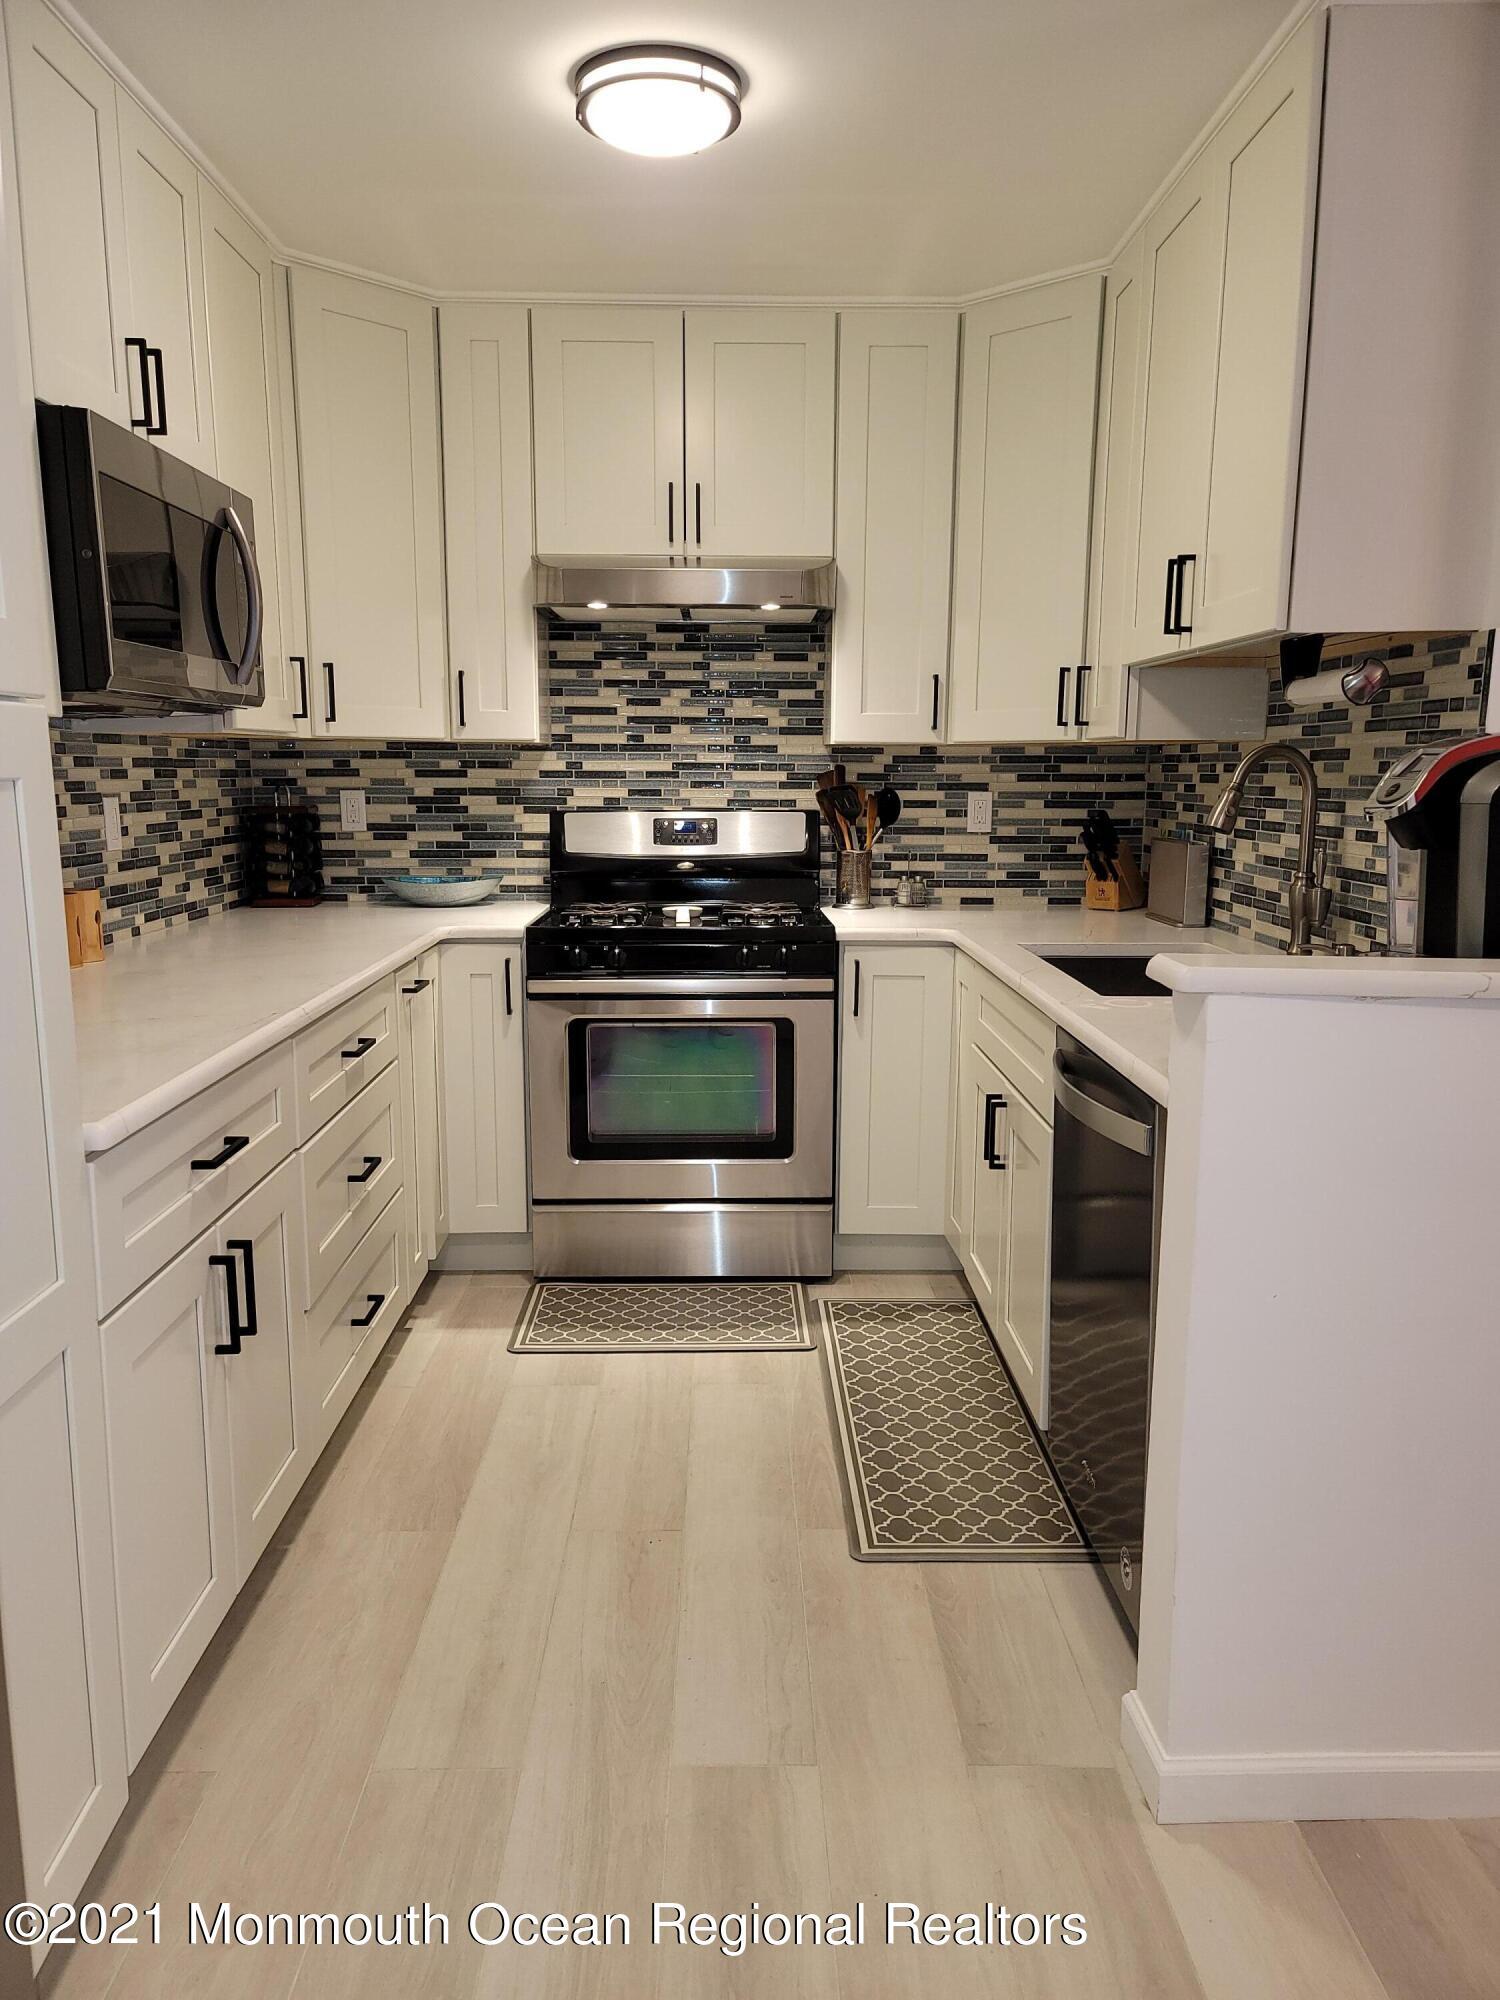 915 Crimson Court, Morganville, New Jersey 07751, 3 Bedrooms Bedrooms, ,3 BathroomsBathrooms,Townhouse,For Sale,915 Crimson Court,2,22107690